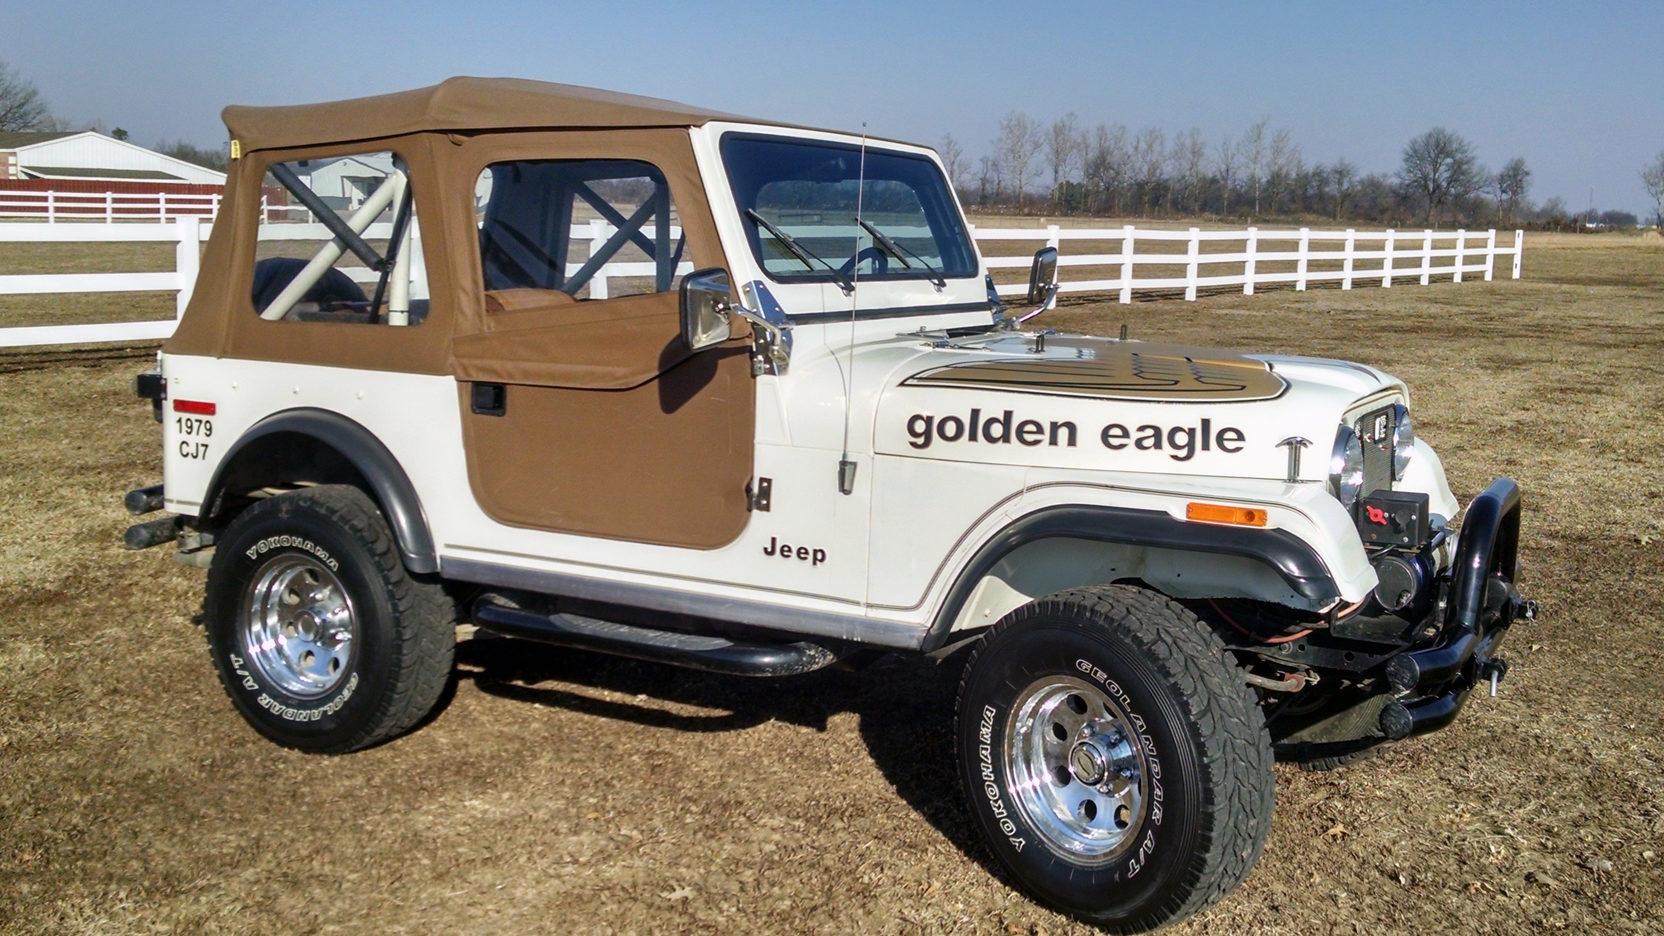 1979 Jeep C-7